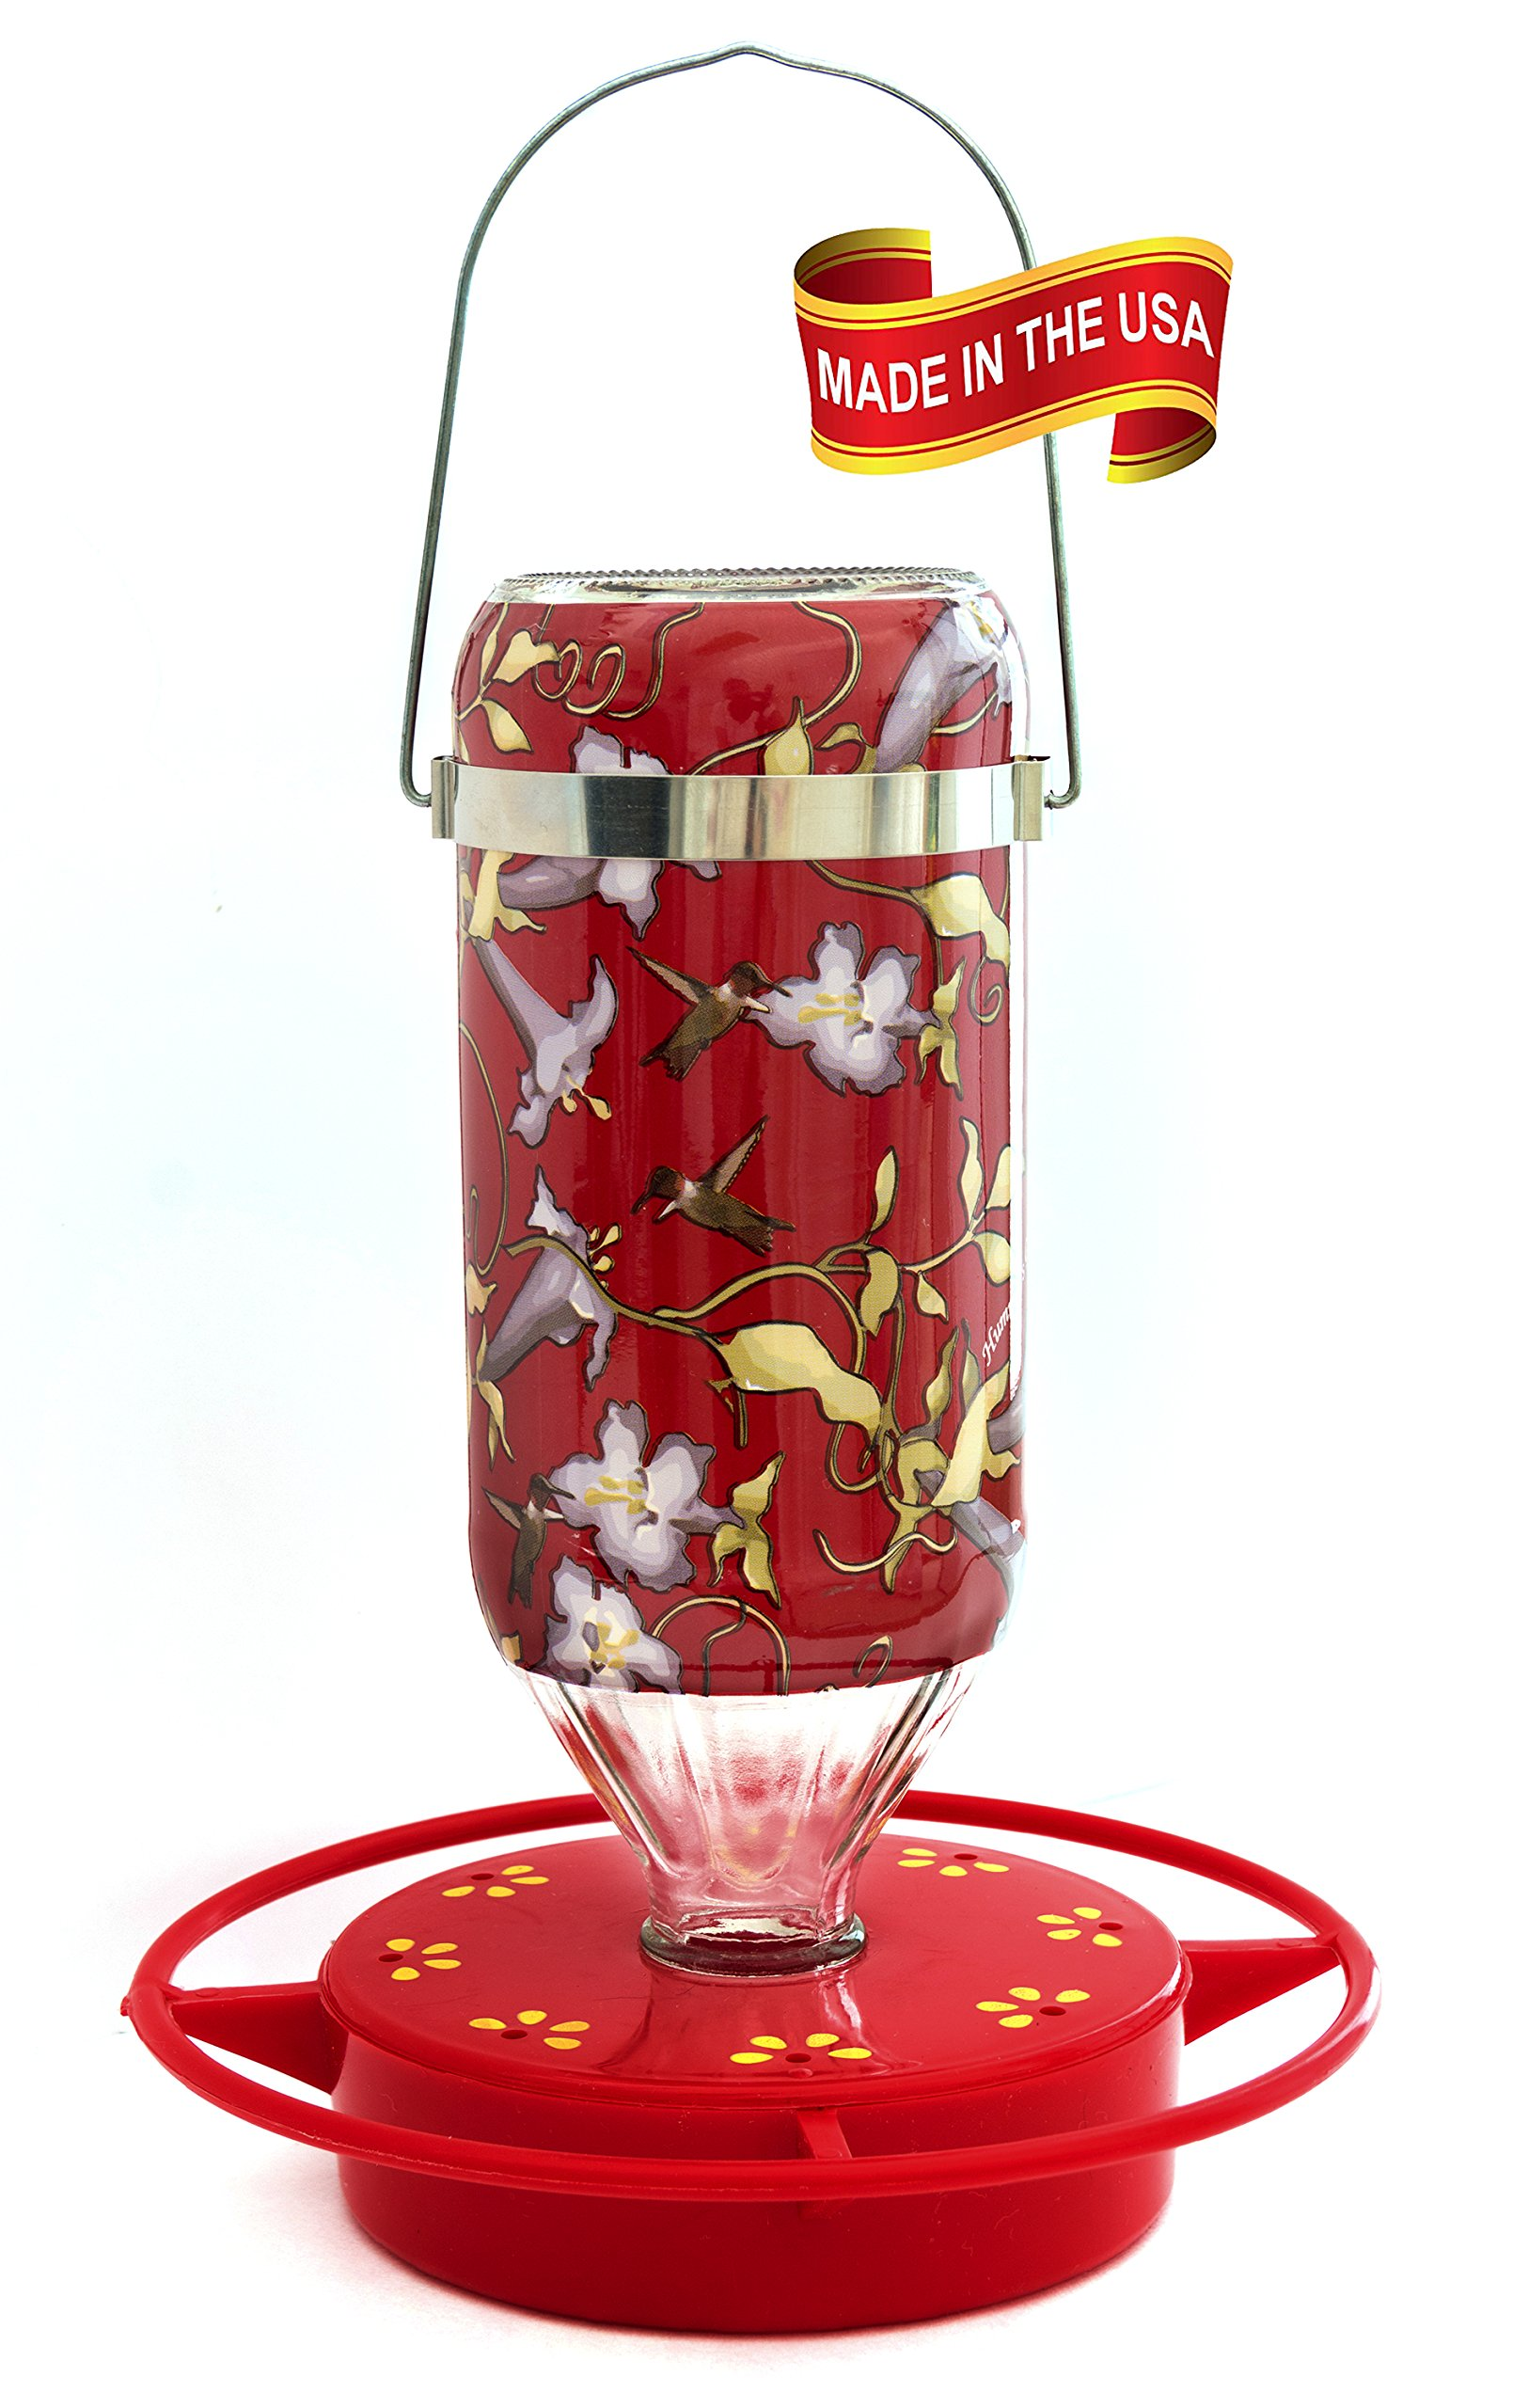 Hummers Galore® Hummingbird Feeder, 16oz Hanging Vine Design Glass Feeder with Base